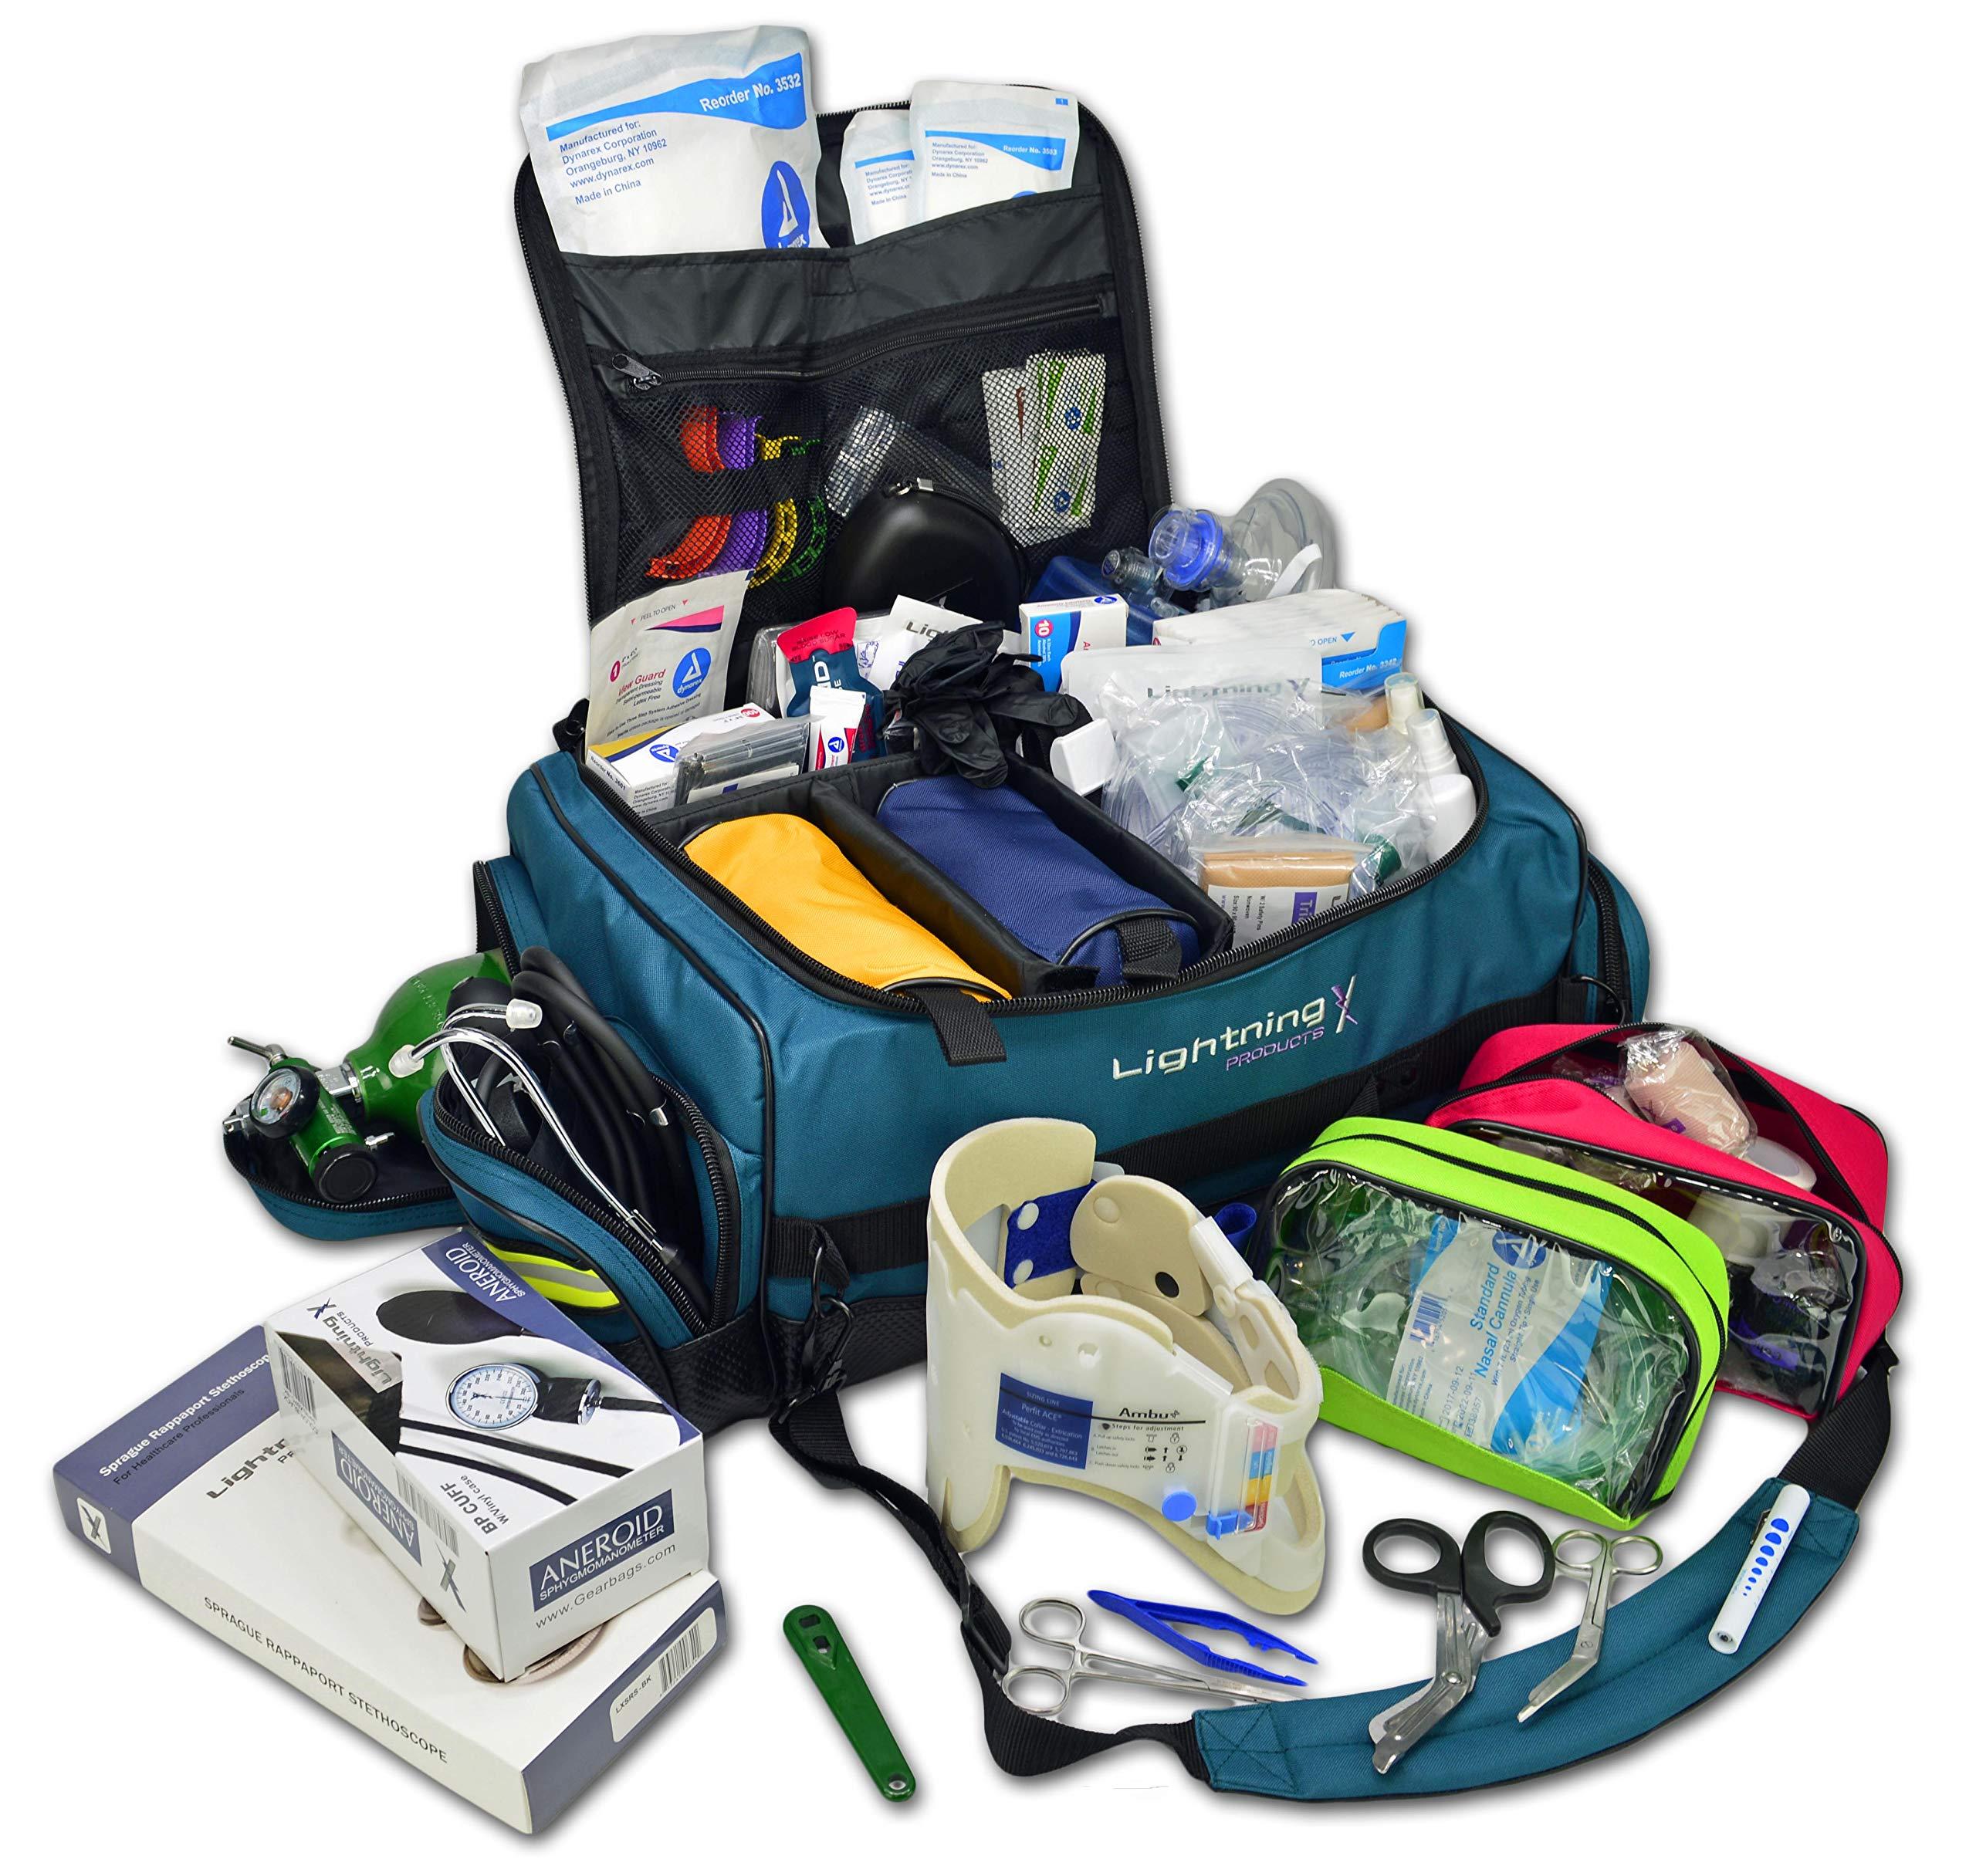 Medic First Responder EMT Trauma Bag Stocked First Aid Advanced Fill Kit